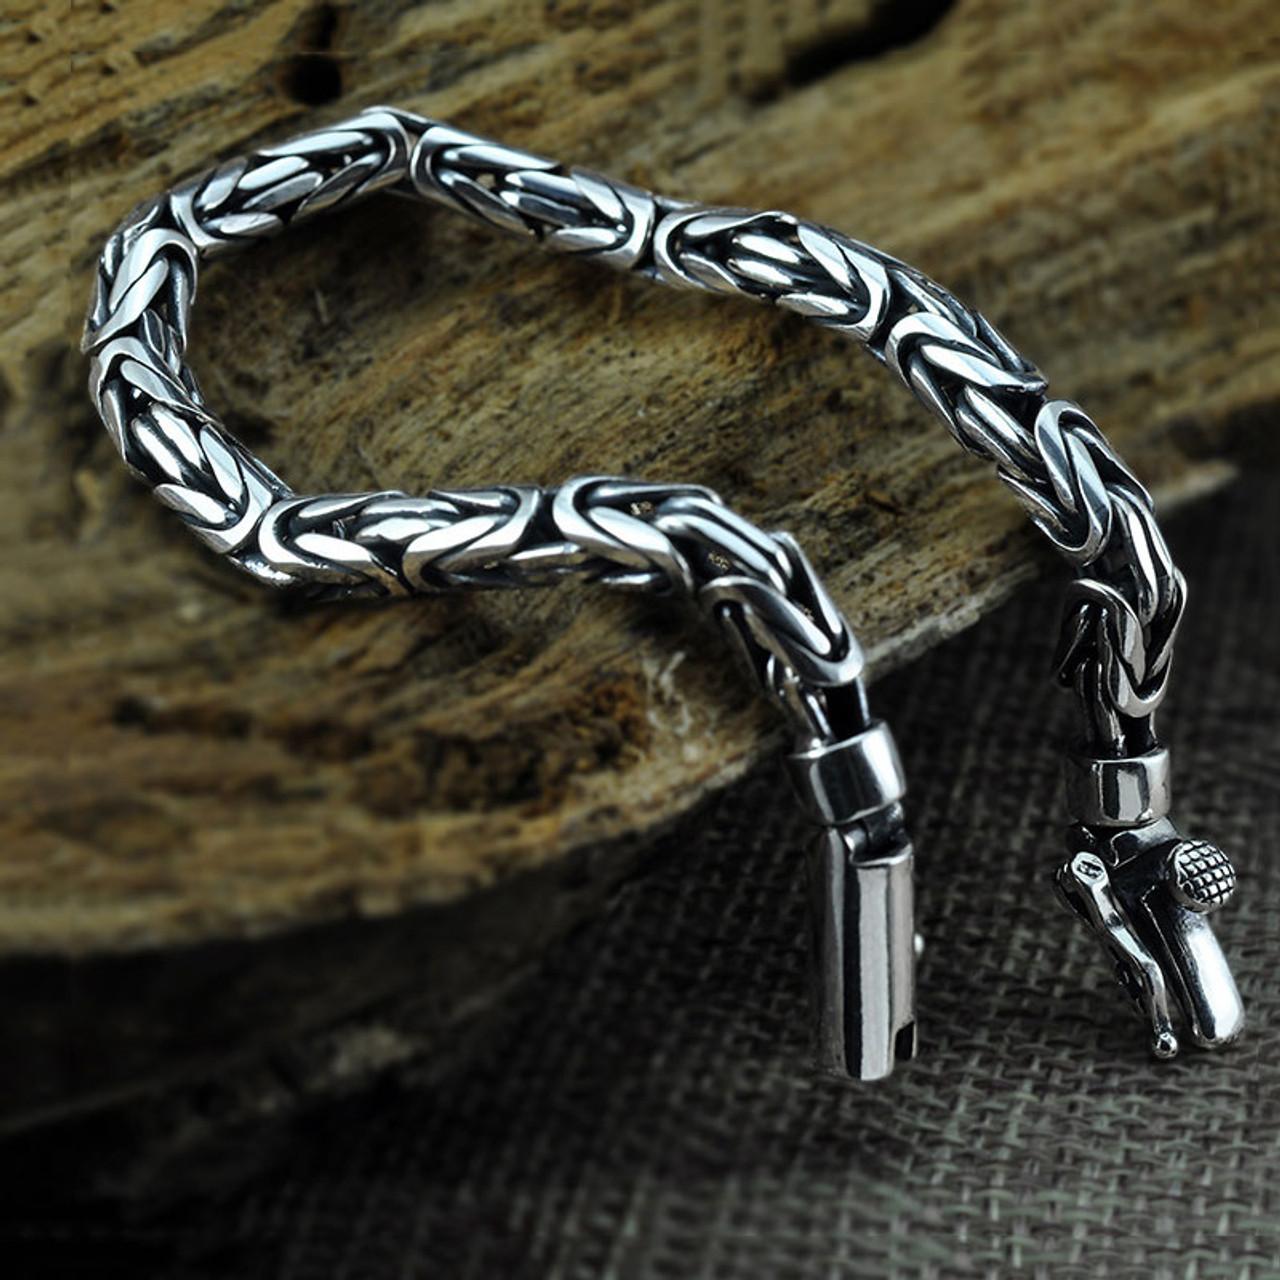 15f380d647d6f3 ... 925Sterling silver bracelet Men Pure 925 Sterling Silver Bracelet  Classic Link Chain S925 Thai Silver Bracelet ...